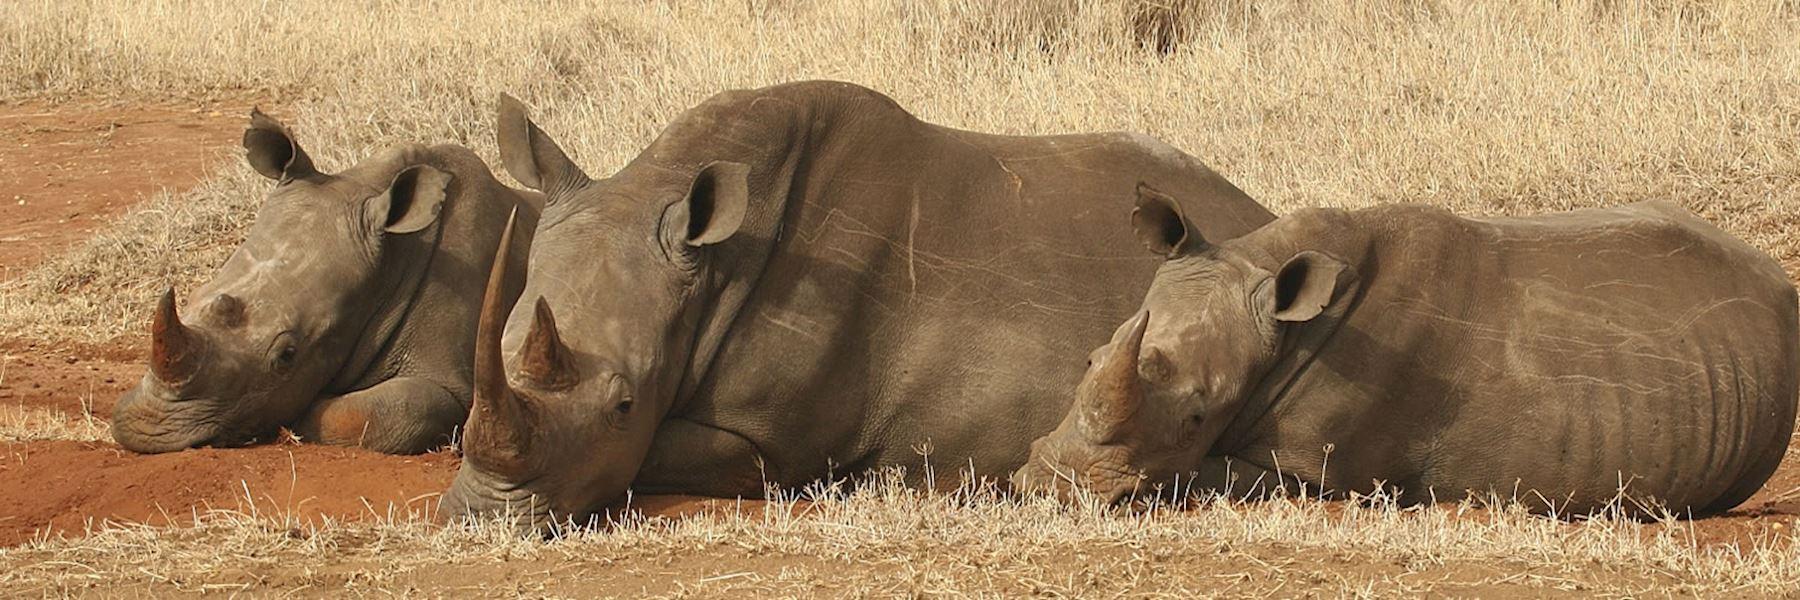 Visit Lewa Wilderness Conservancy, Kenya